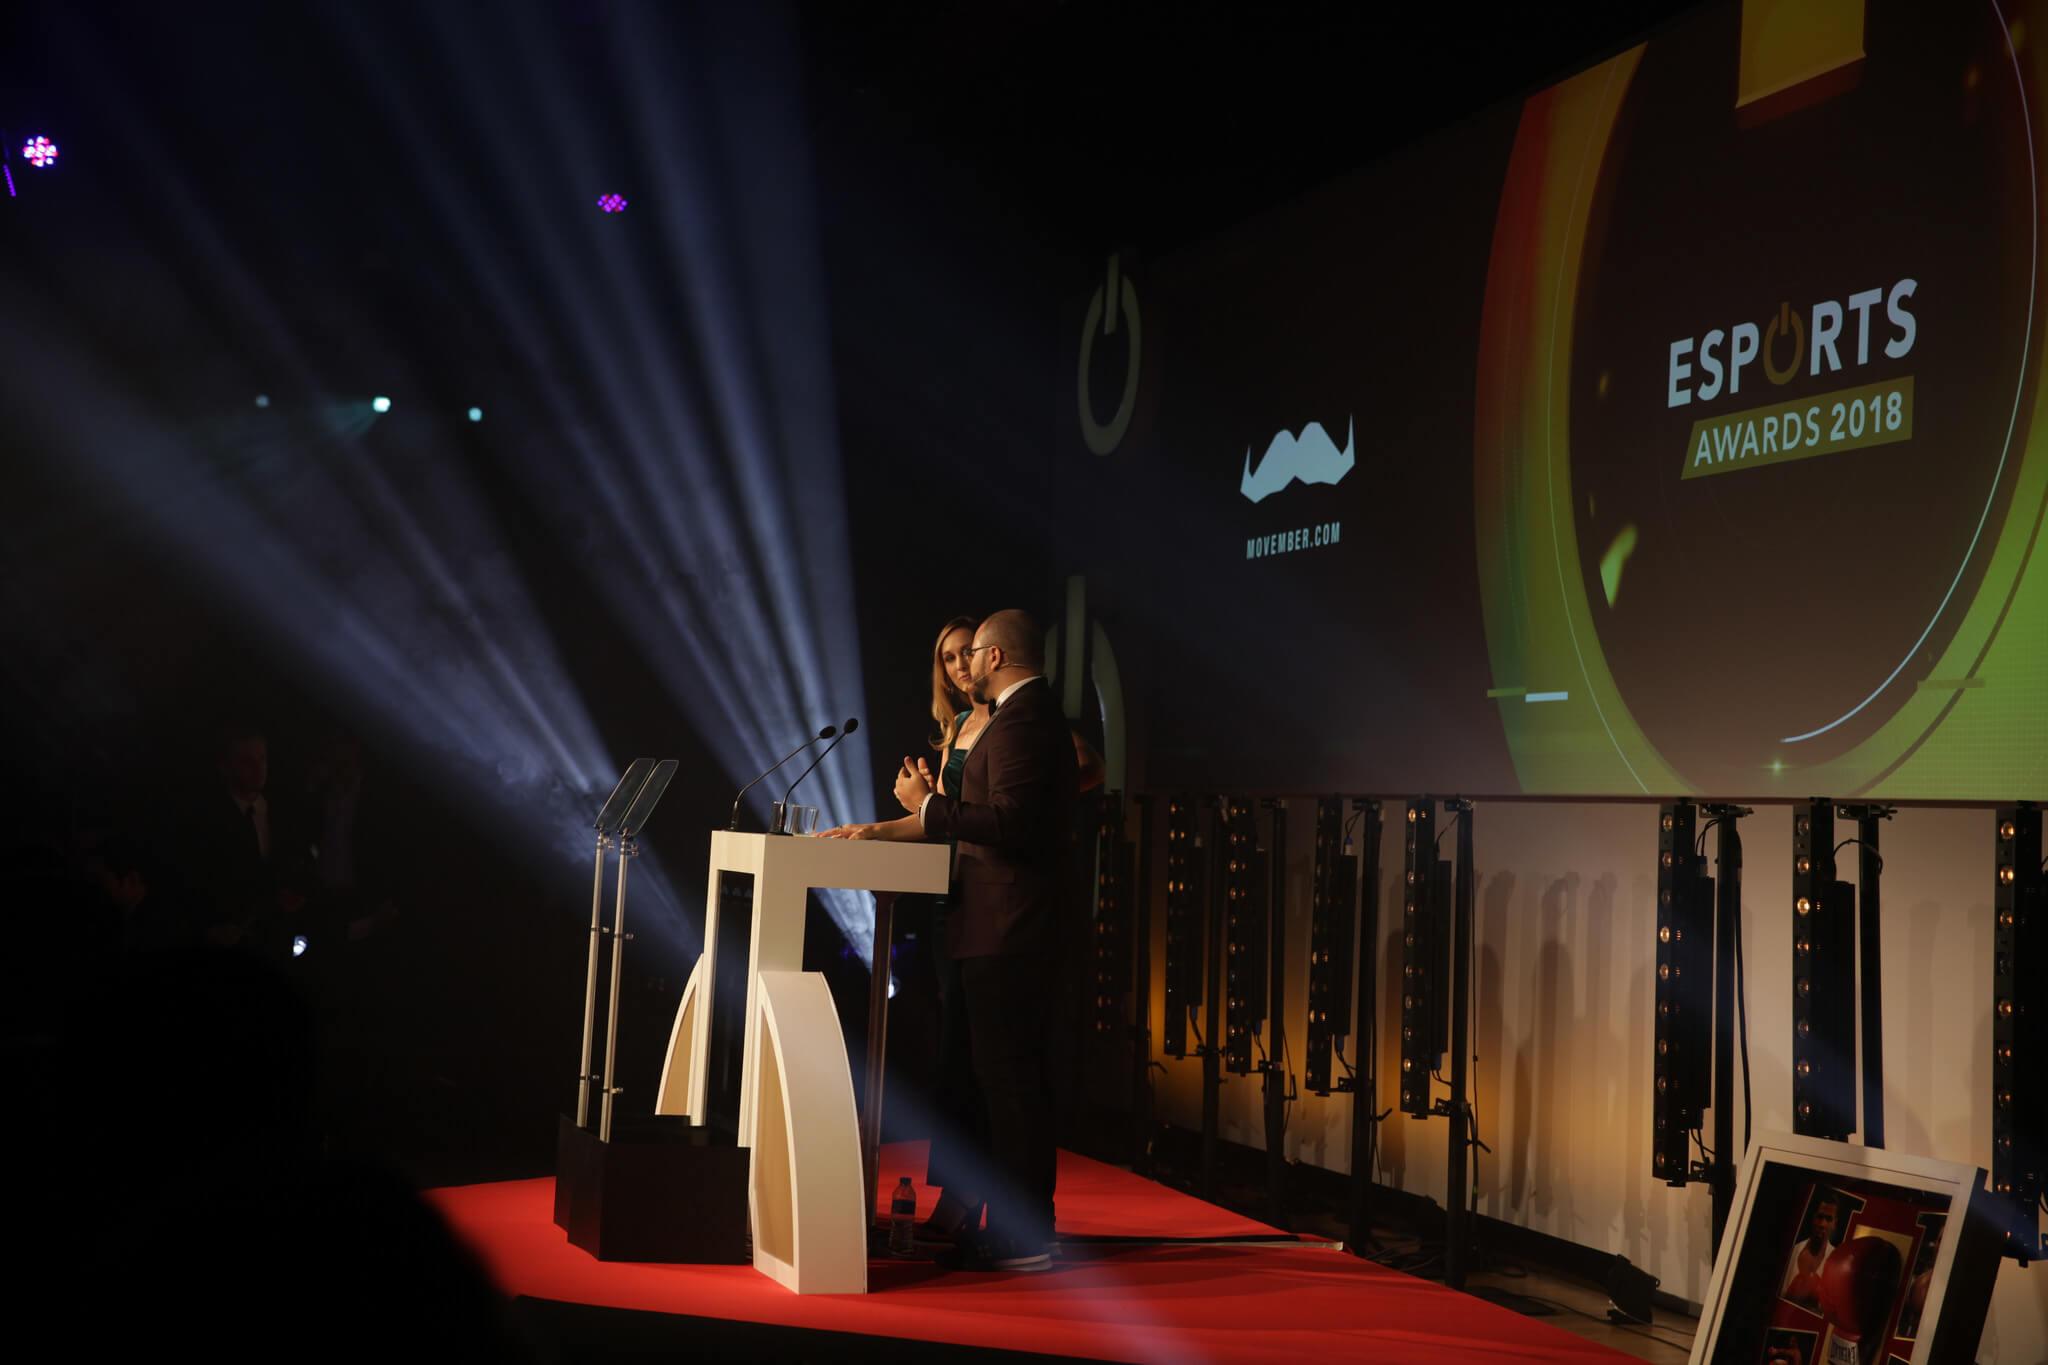 Overwatch, Fortnite and Ninja win big at the Esports Awards 2018